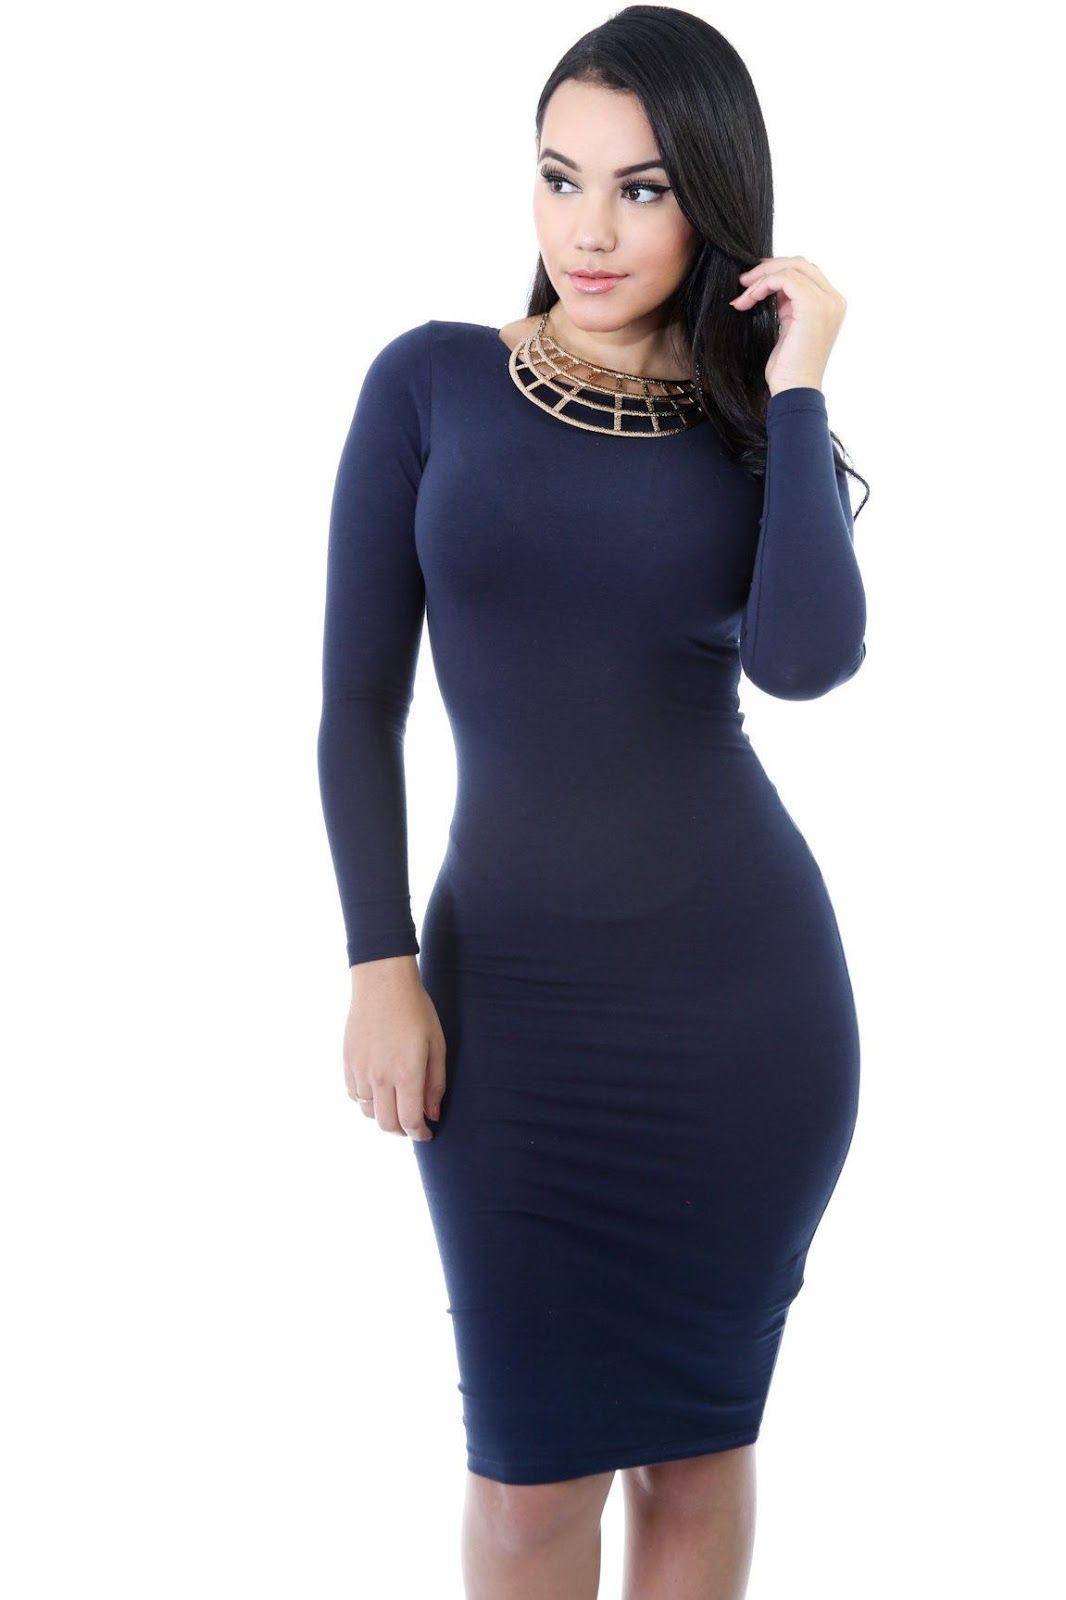 Looks Moda Vestidos ¡hermosos Cortos De Juveniles101 34RAjLcq5